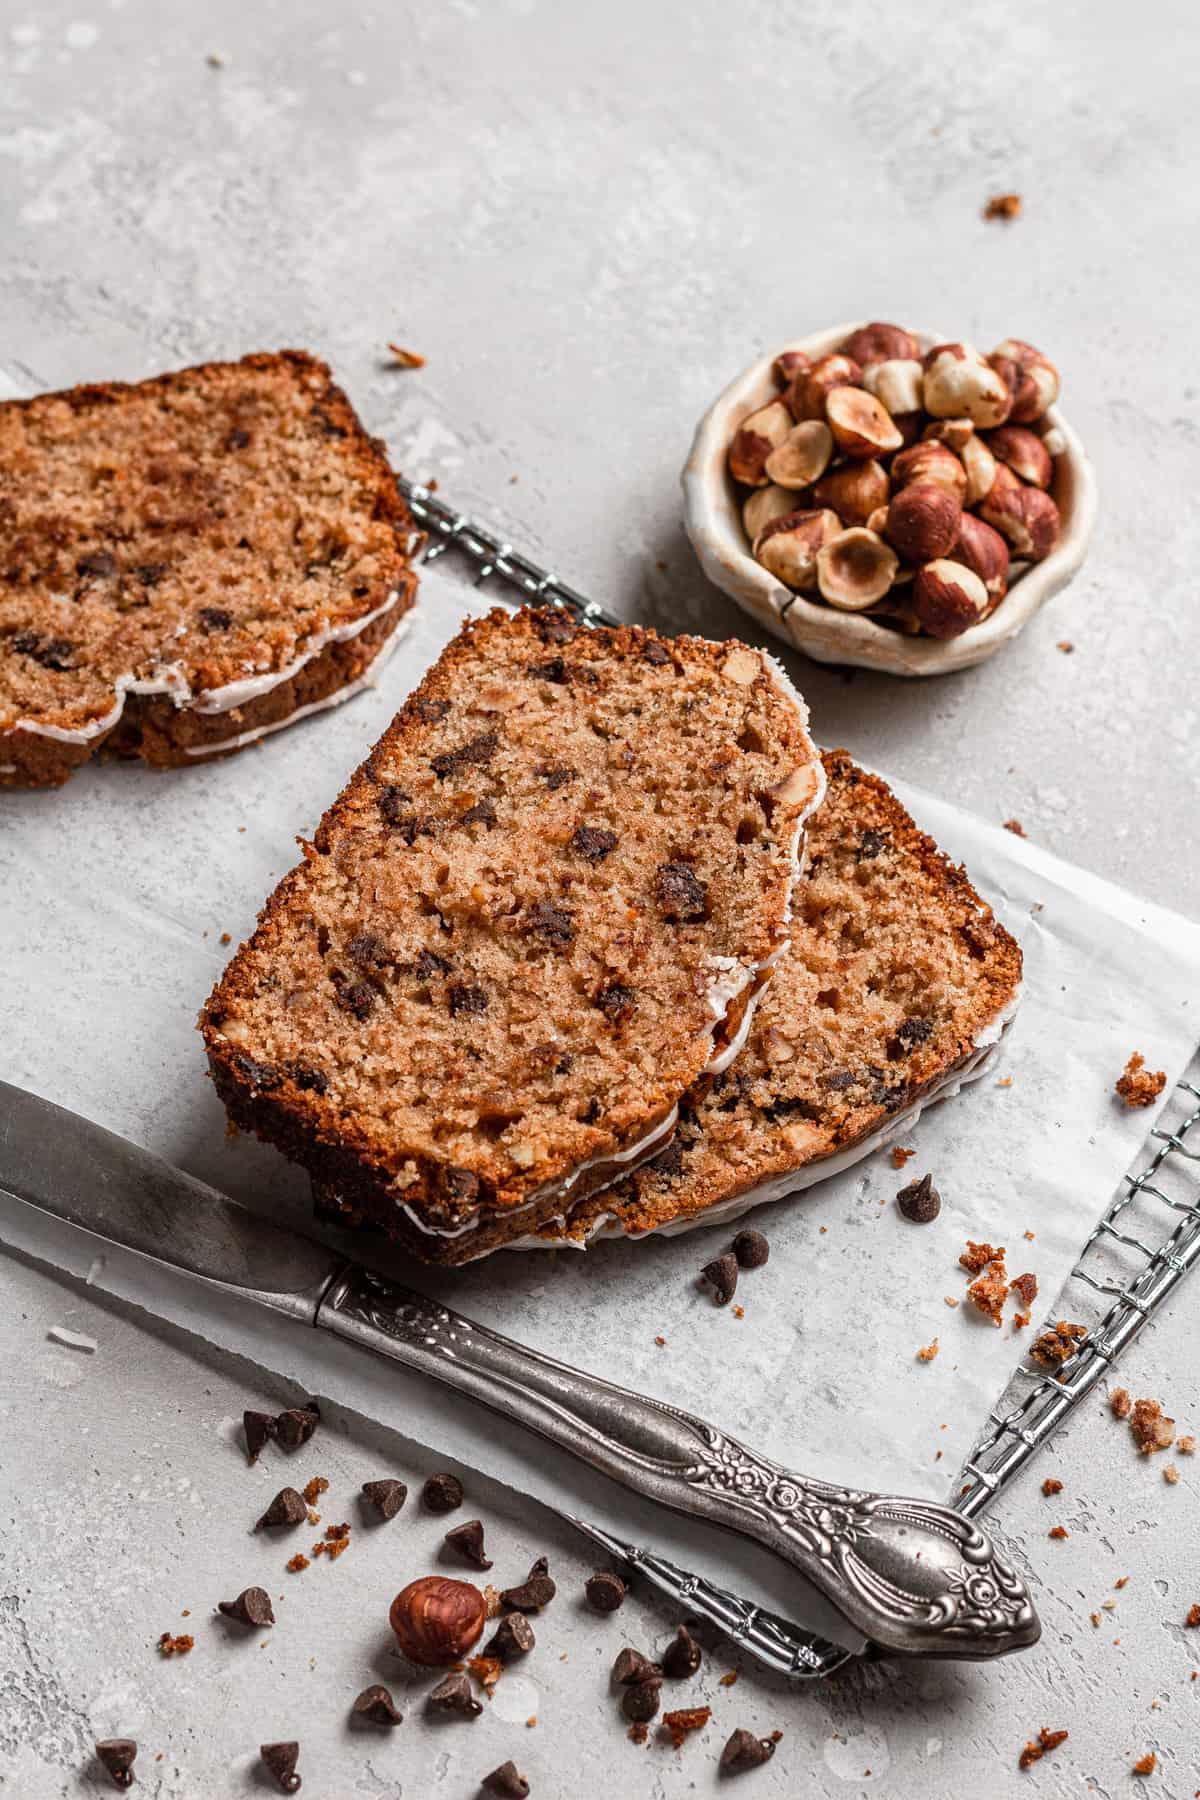 Chocolate chips hazelnut bread recipe